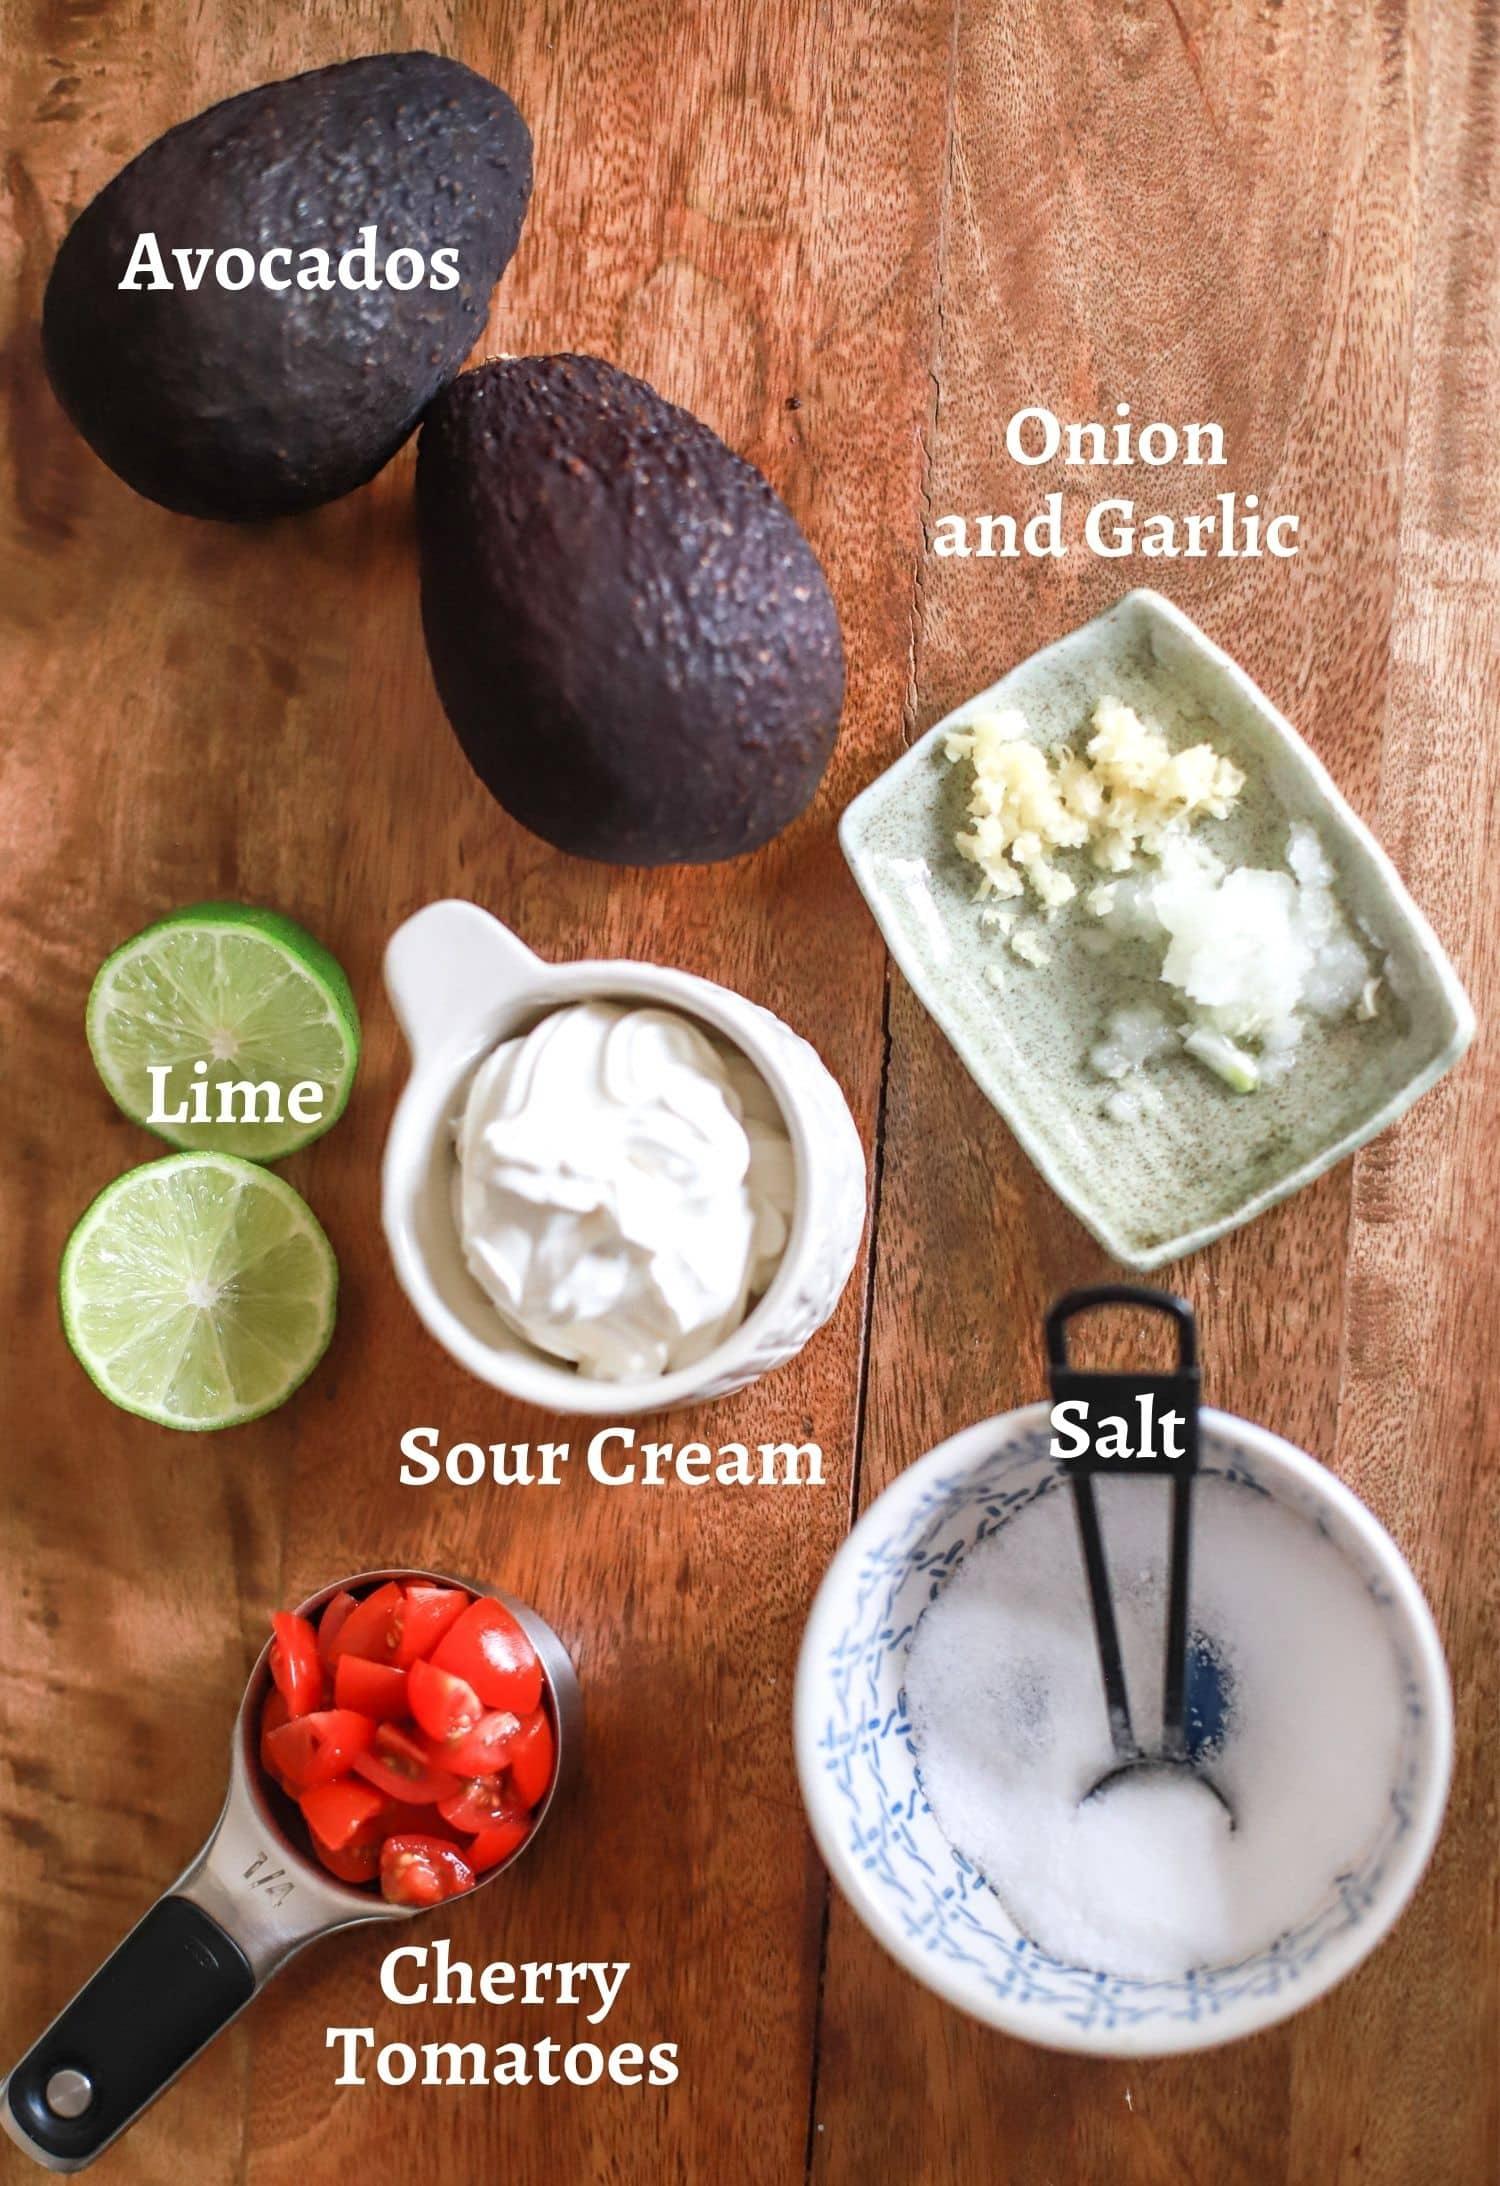 Sour Cream Guacamole Ingredients